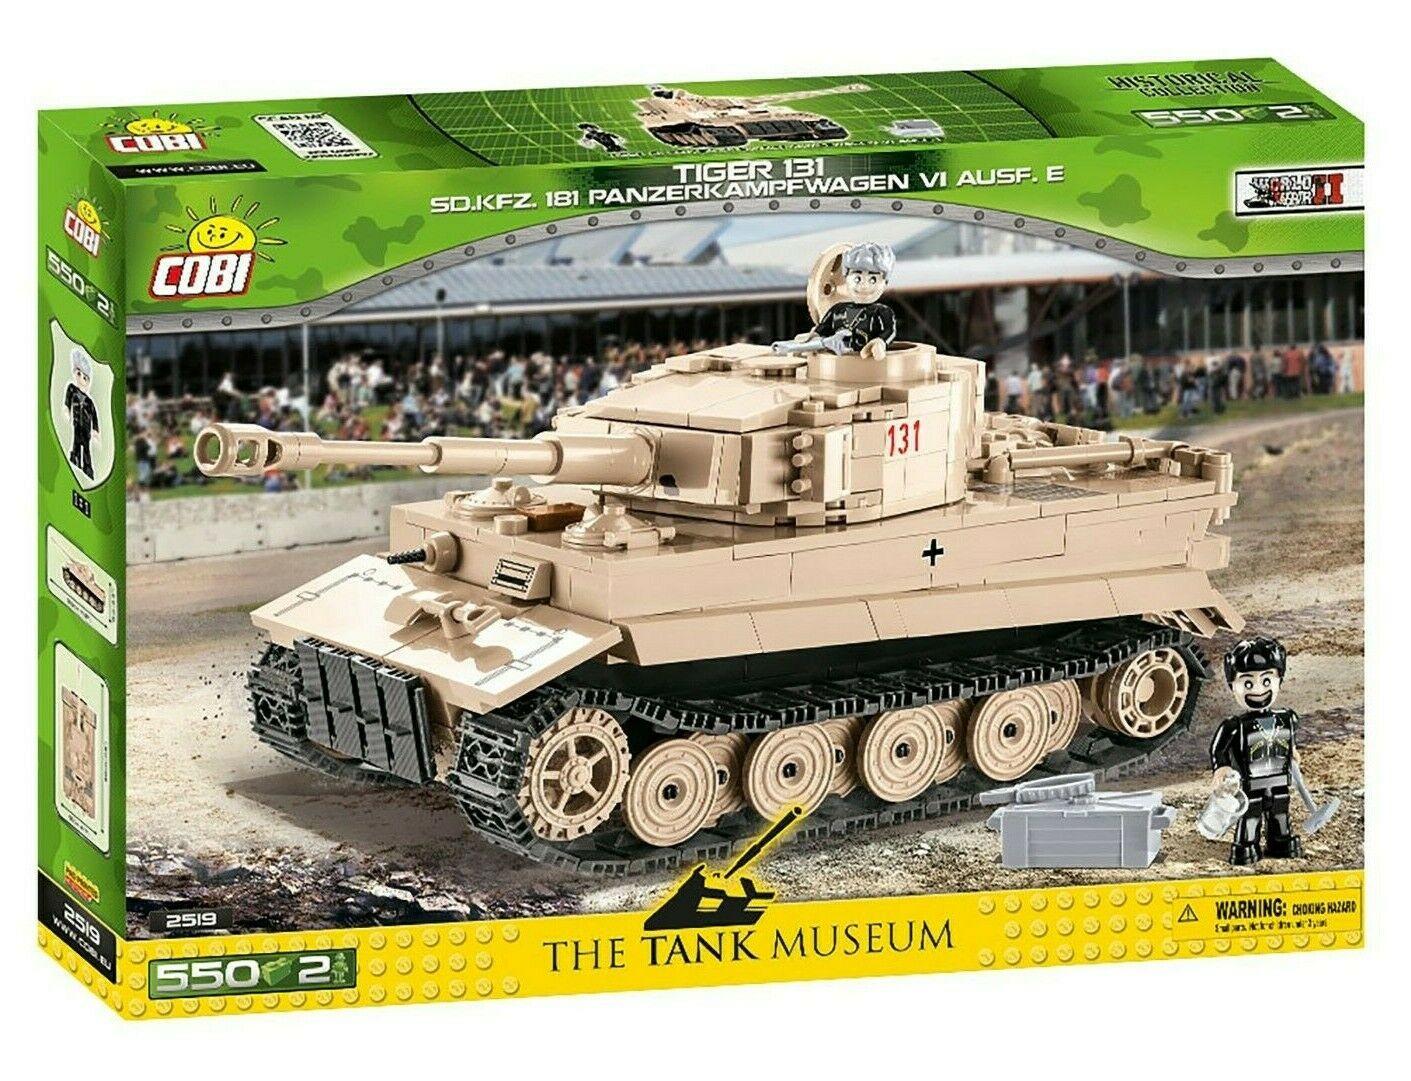 COBI TIGER 131 CARRO ARMATO PESANTE SD.KFZ.181 WWII 2519